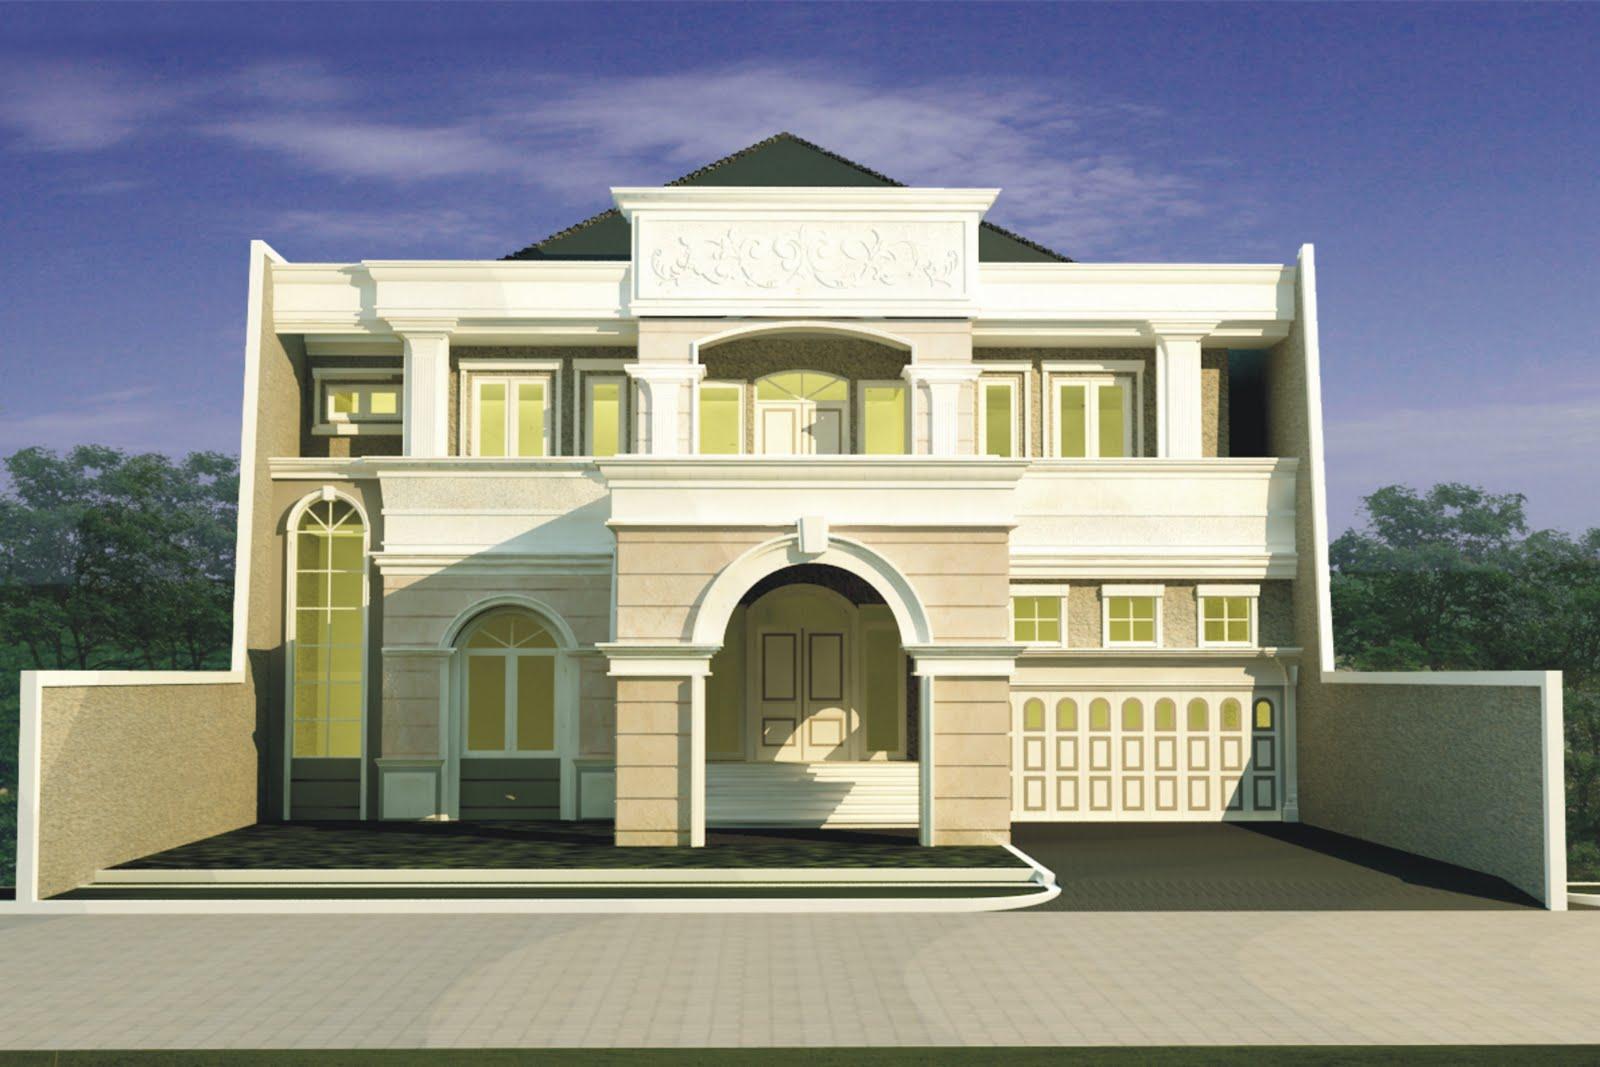 rumah minimalis modern klasik hunian damai dan tenang